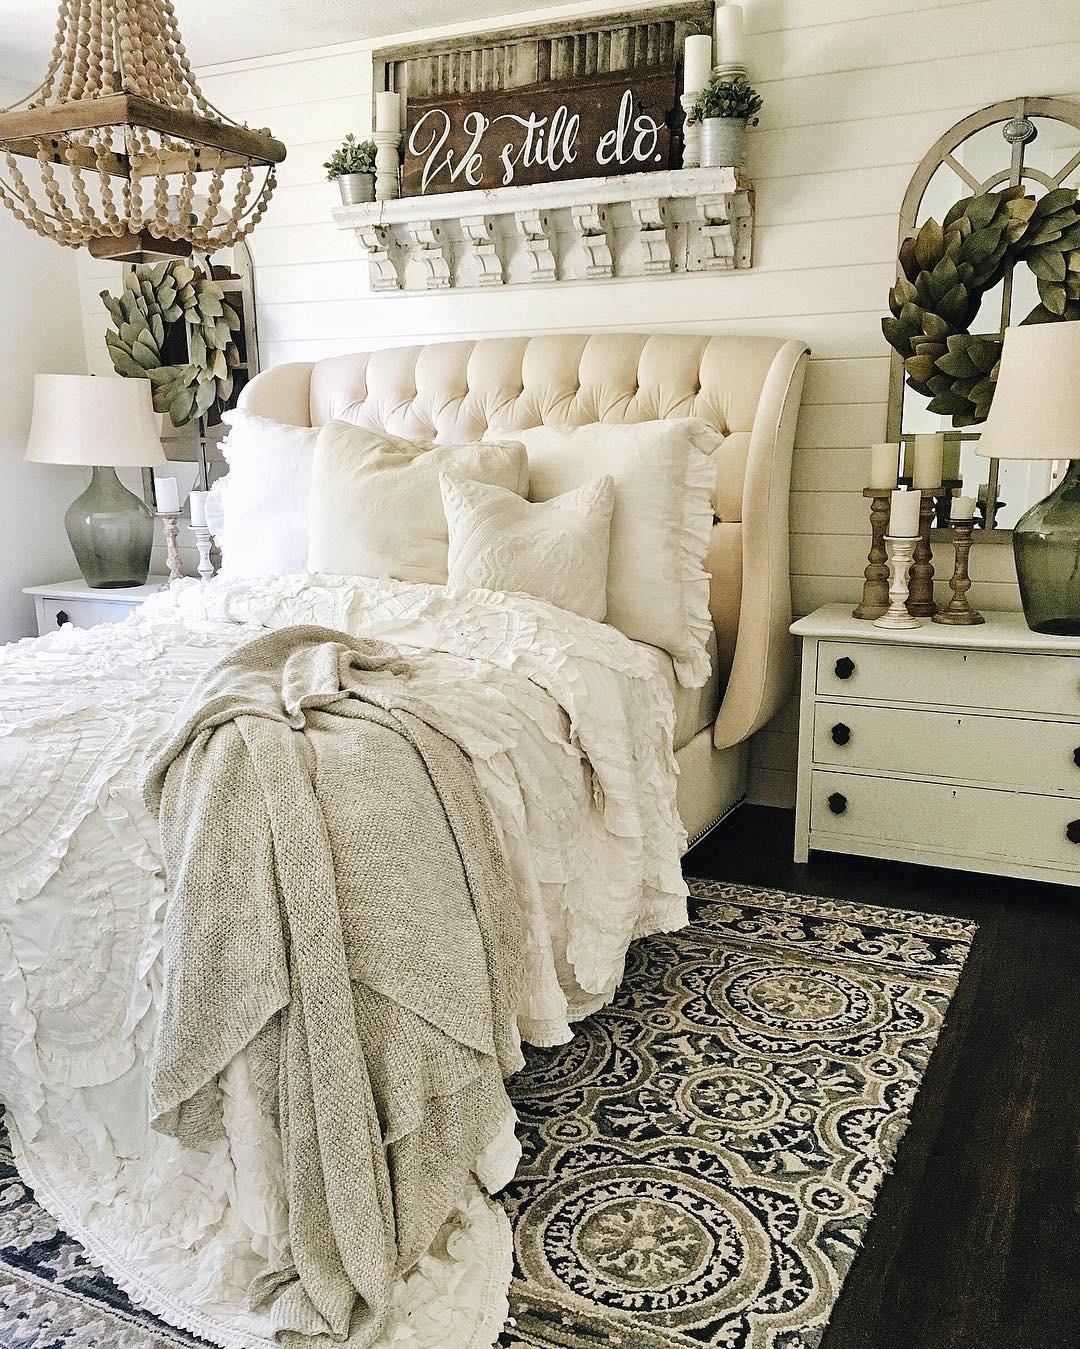 Country Decorating Ideas   Country & Farmhouse Decor on Bedroom Farmhouse Decor  id=97235